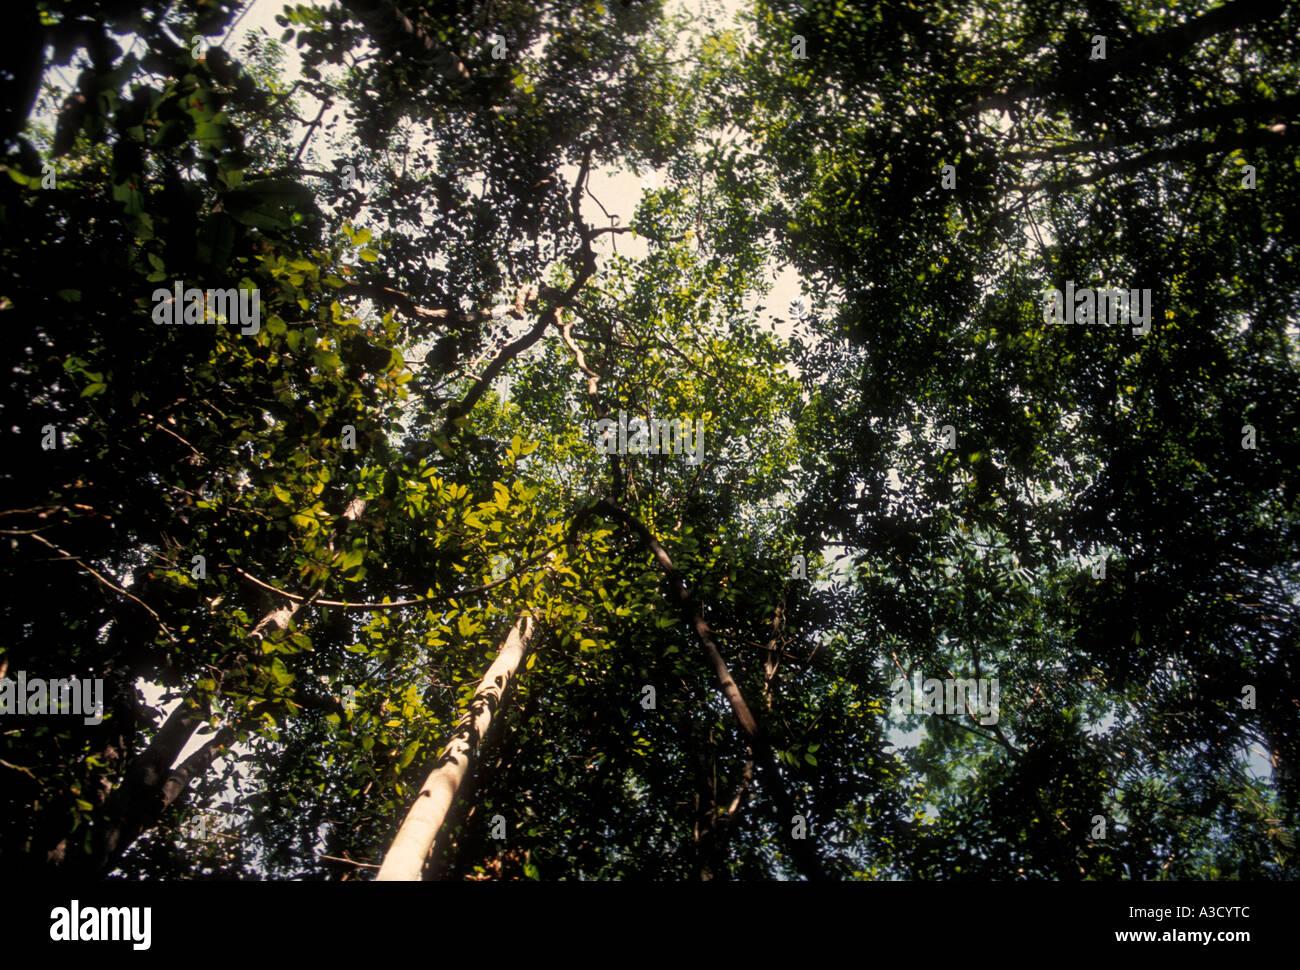 flora, jungle canopy, Puraquequara River, Amazon River Basin, northeast of the city of Manaus, Amazonas State, Brazil, Stock Photo